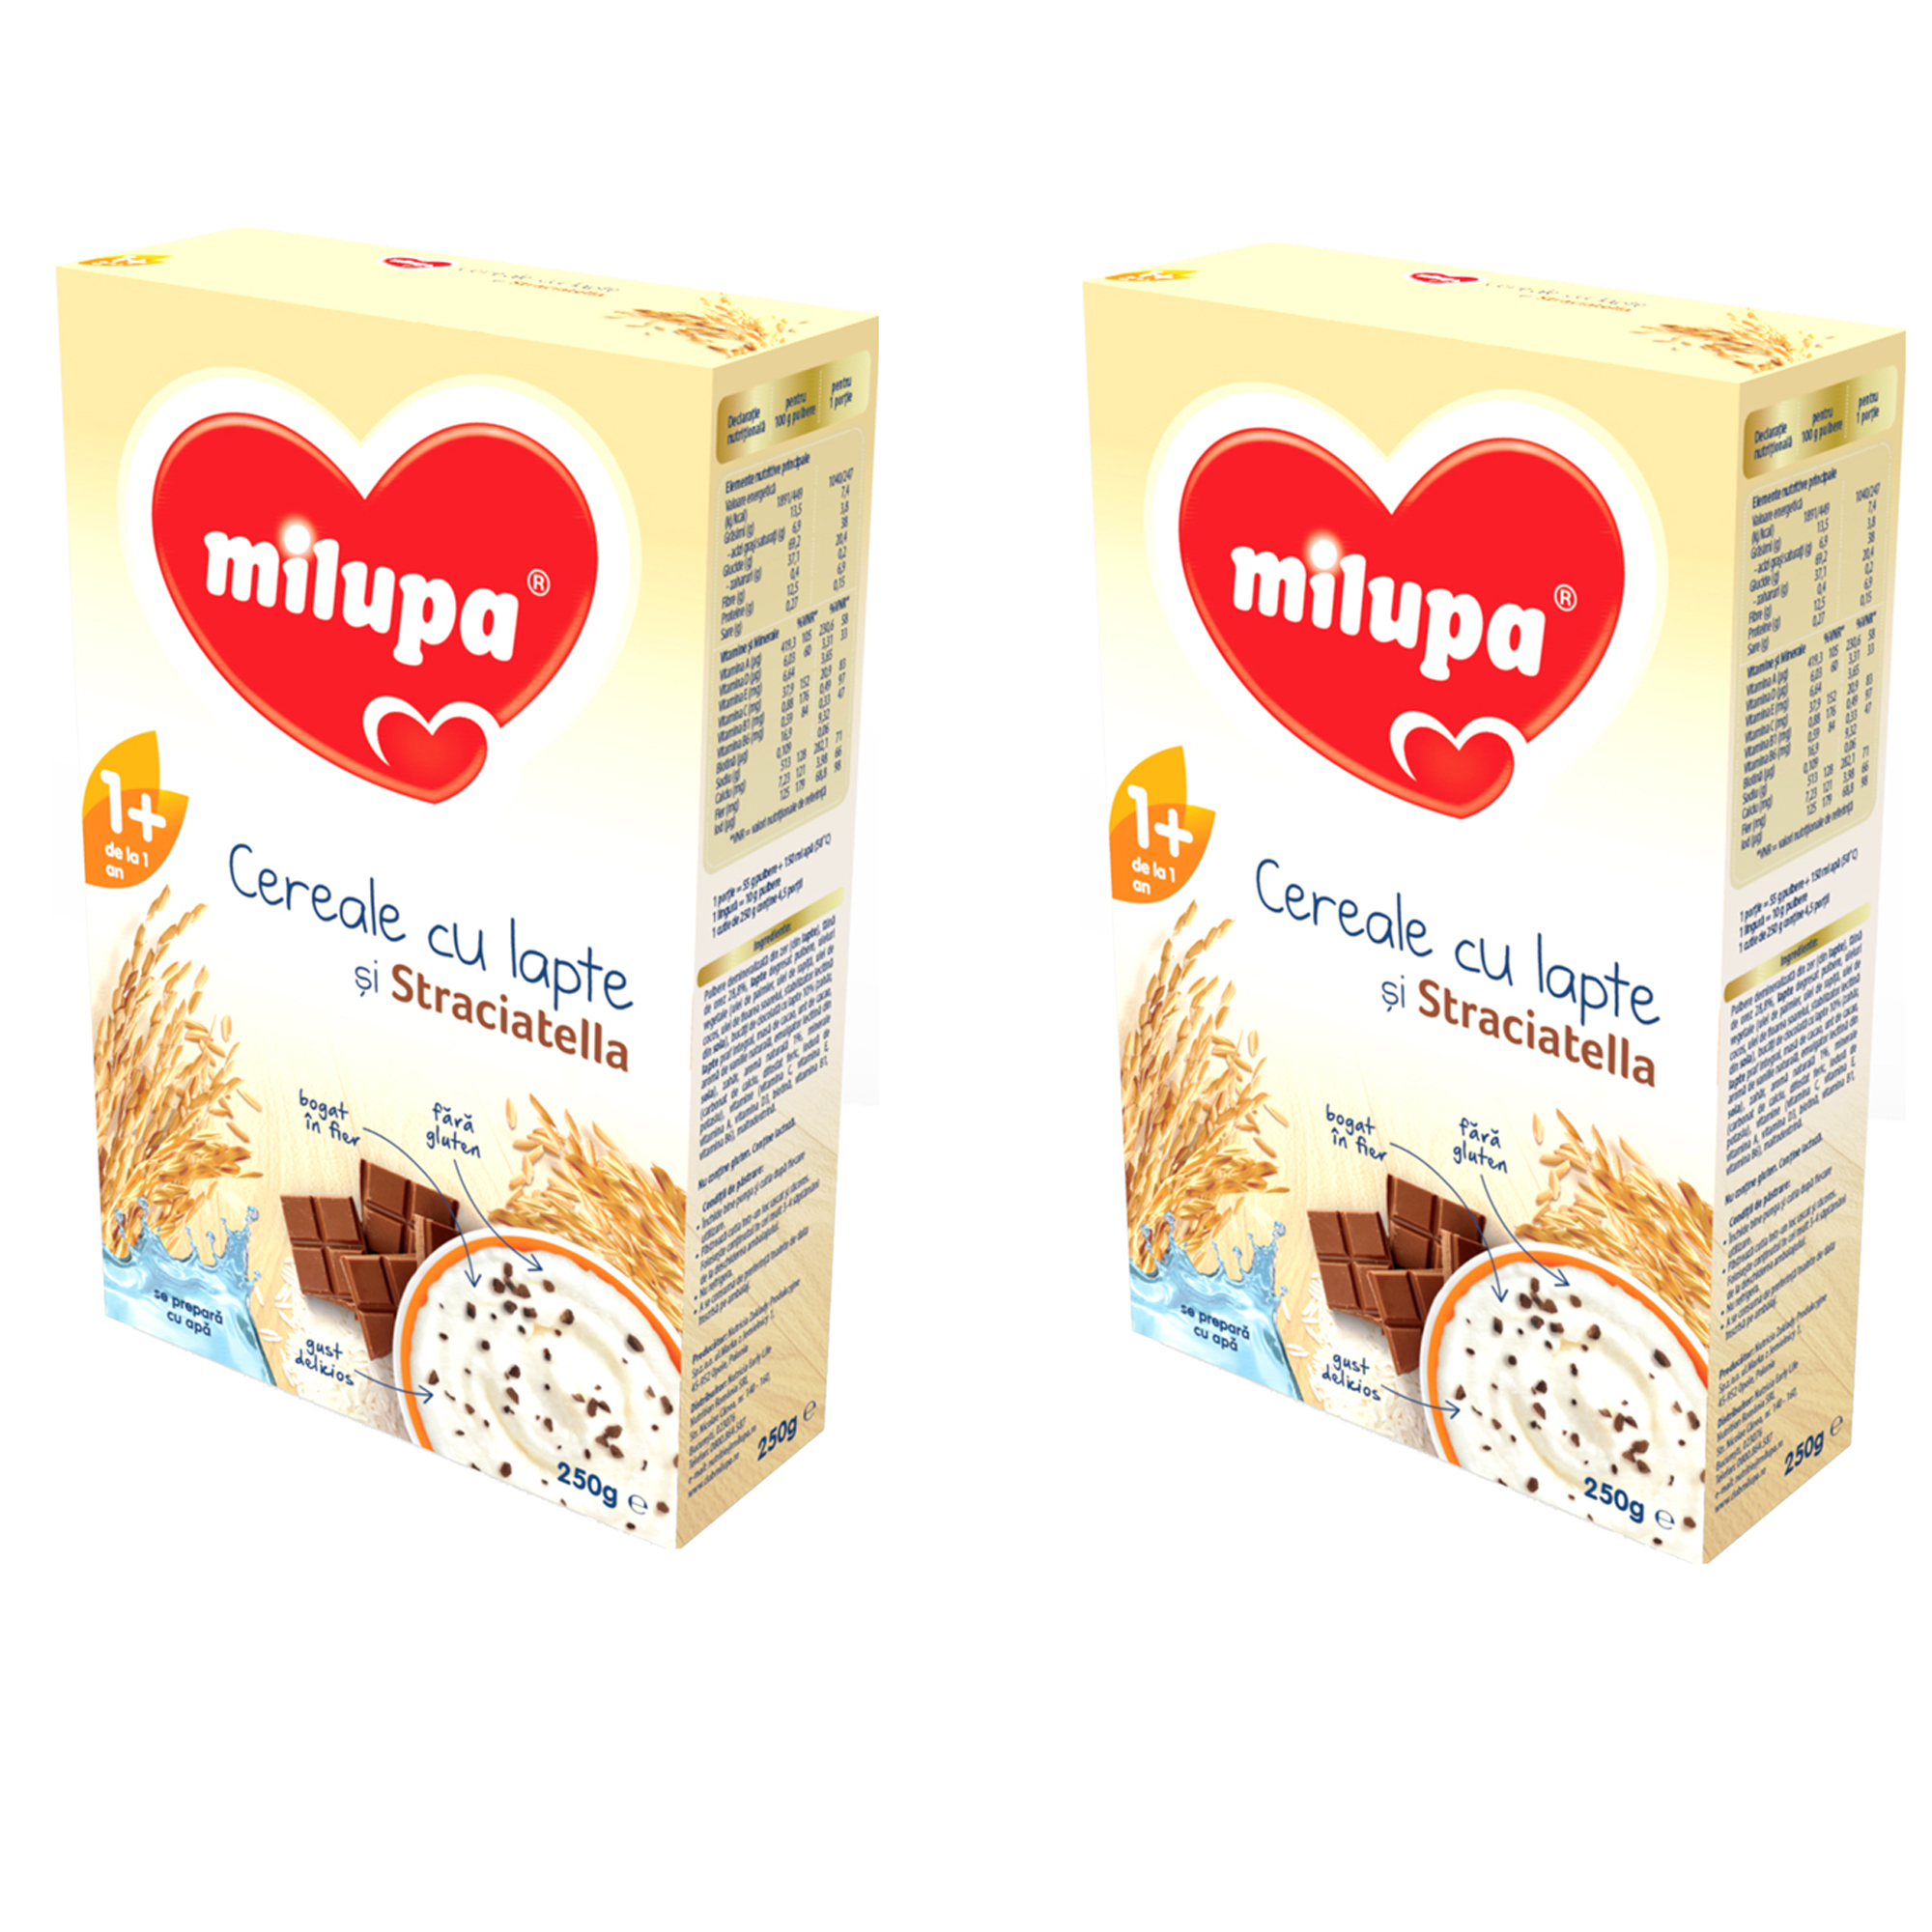 Pachet 2 x Milupa Cereale cu lapte si stracciatella, 250g, 12 luni+